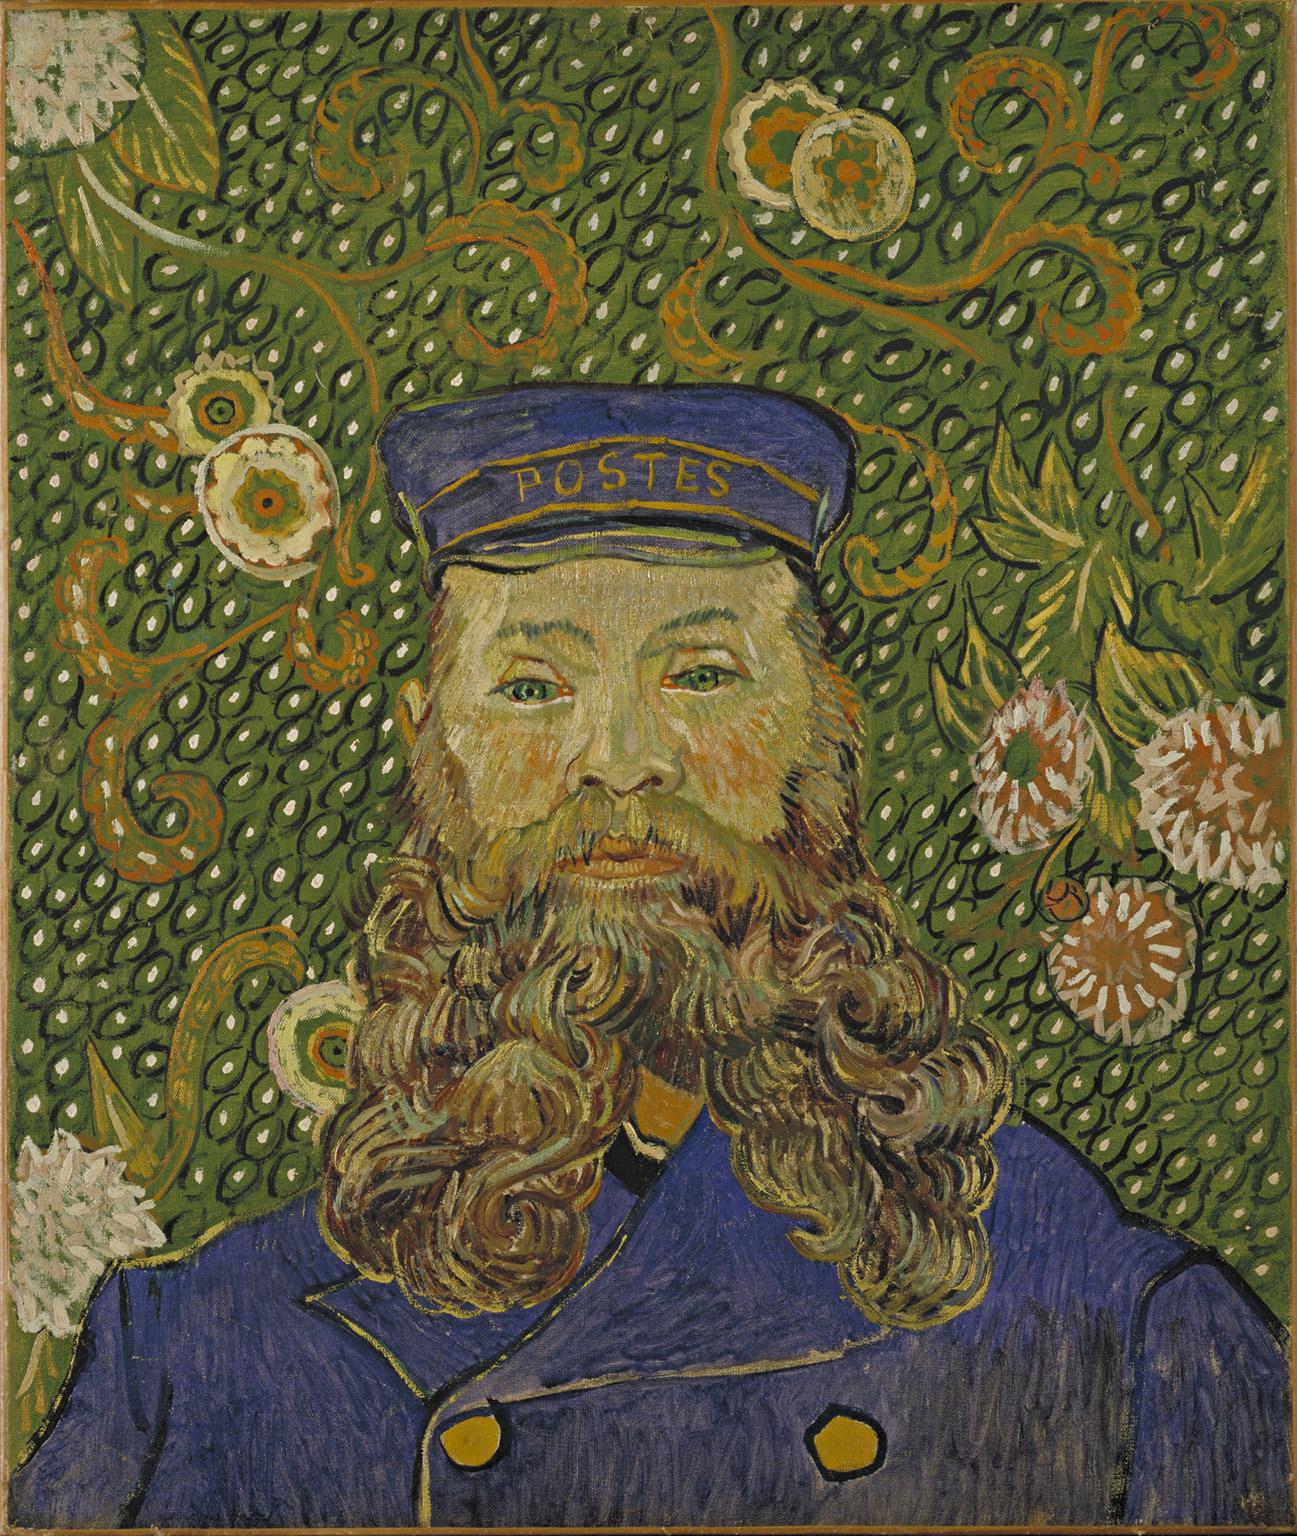 van-gogh-portrait-of-joseph-roulin-1889